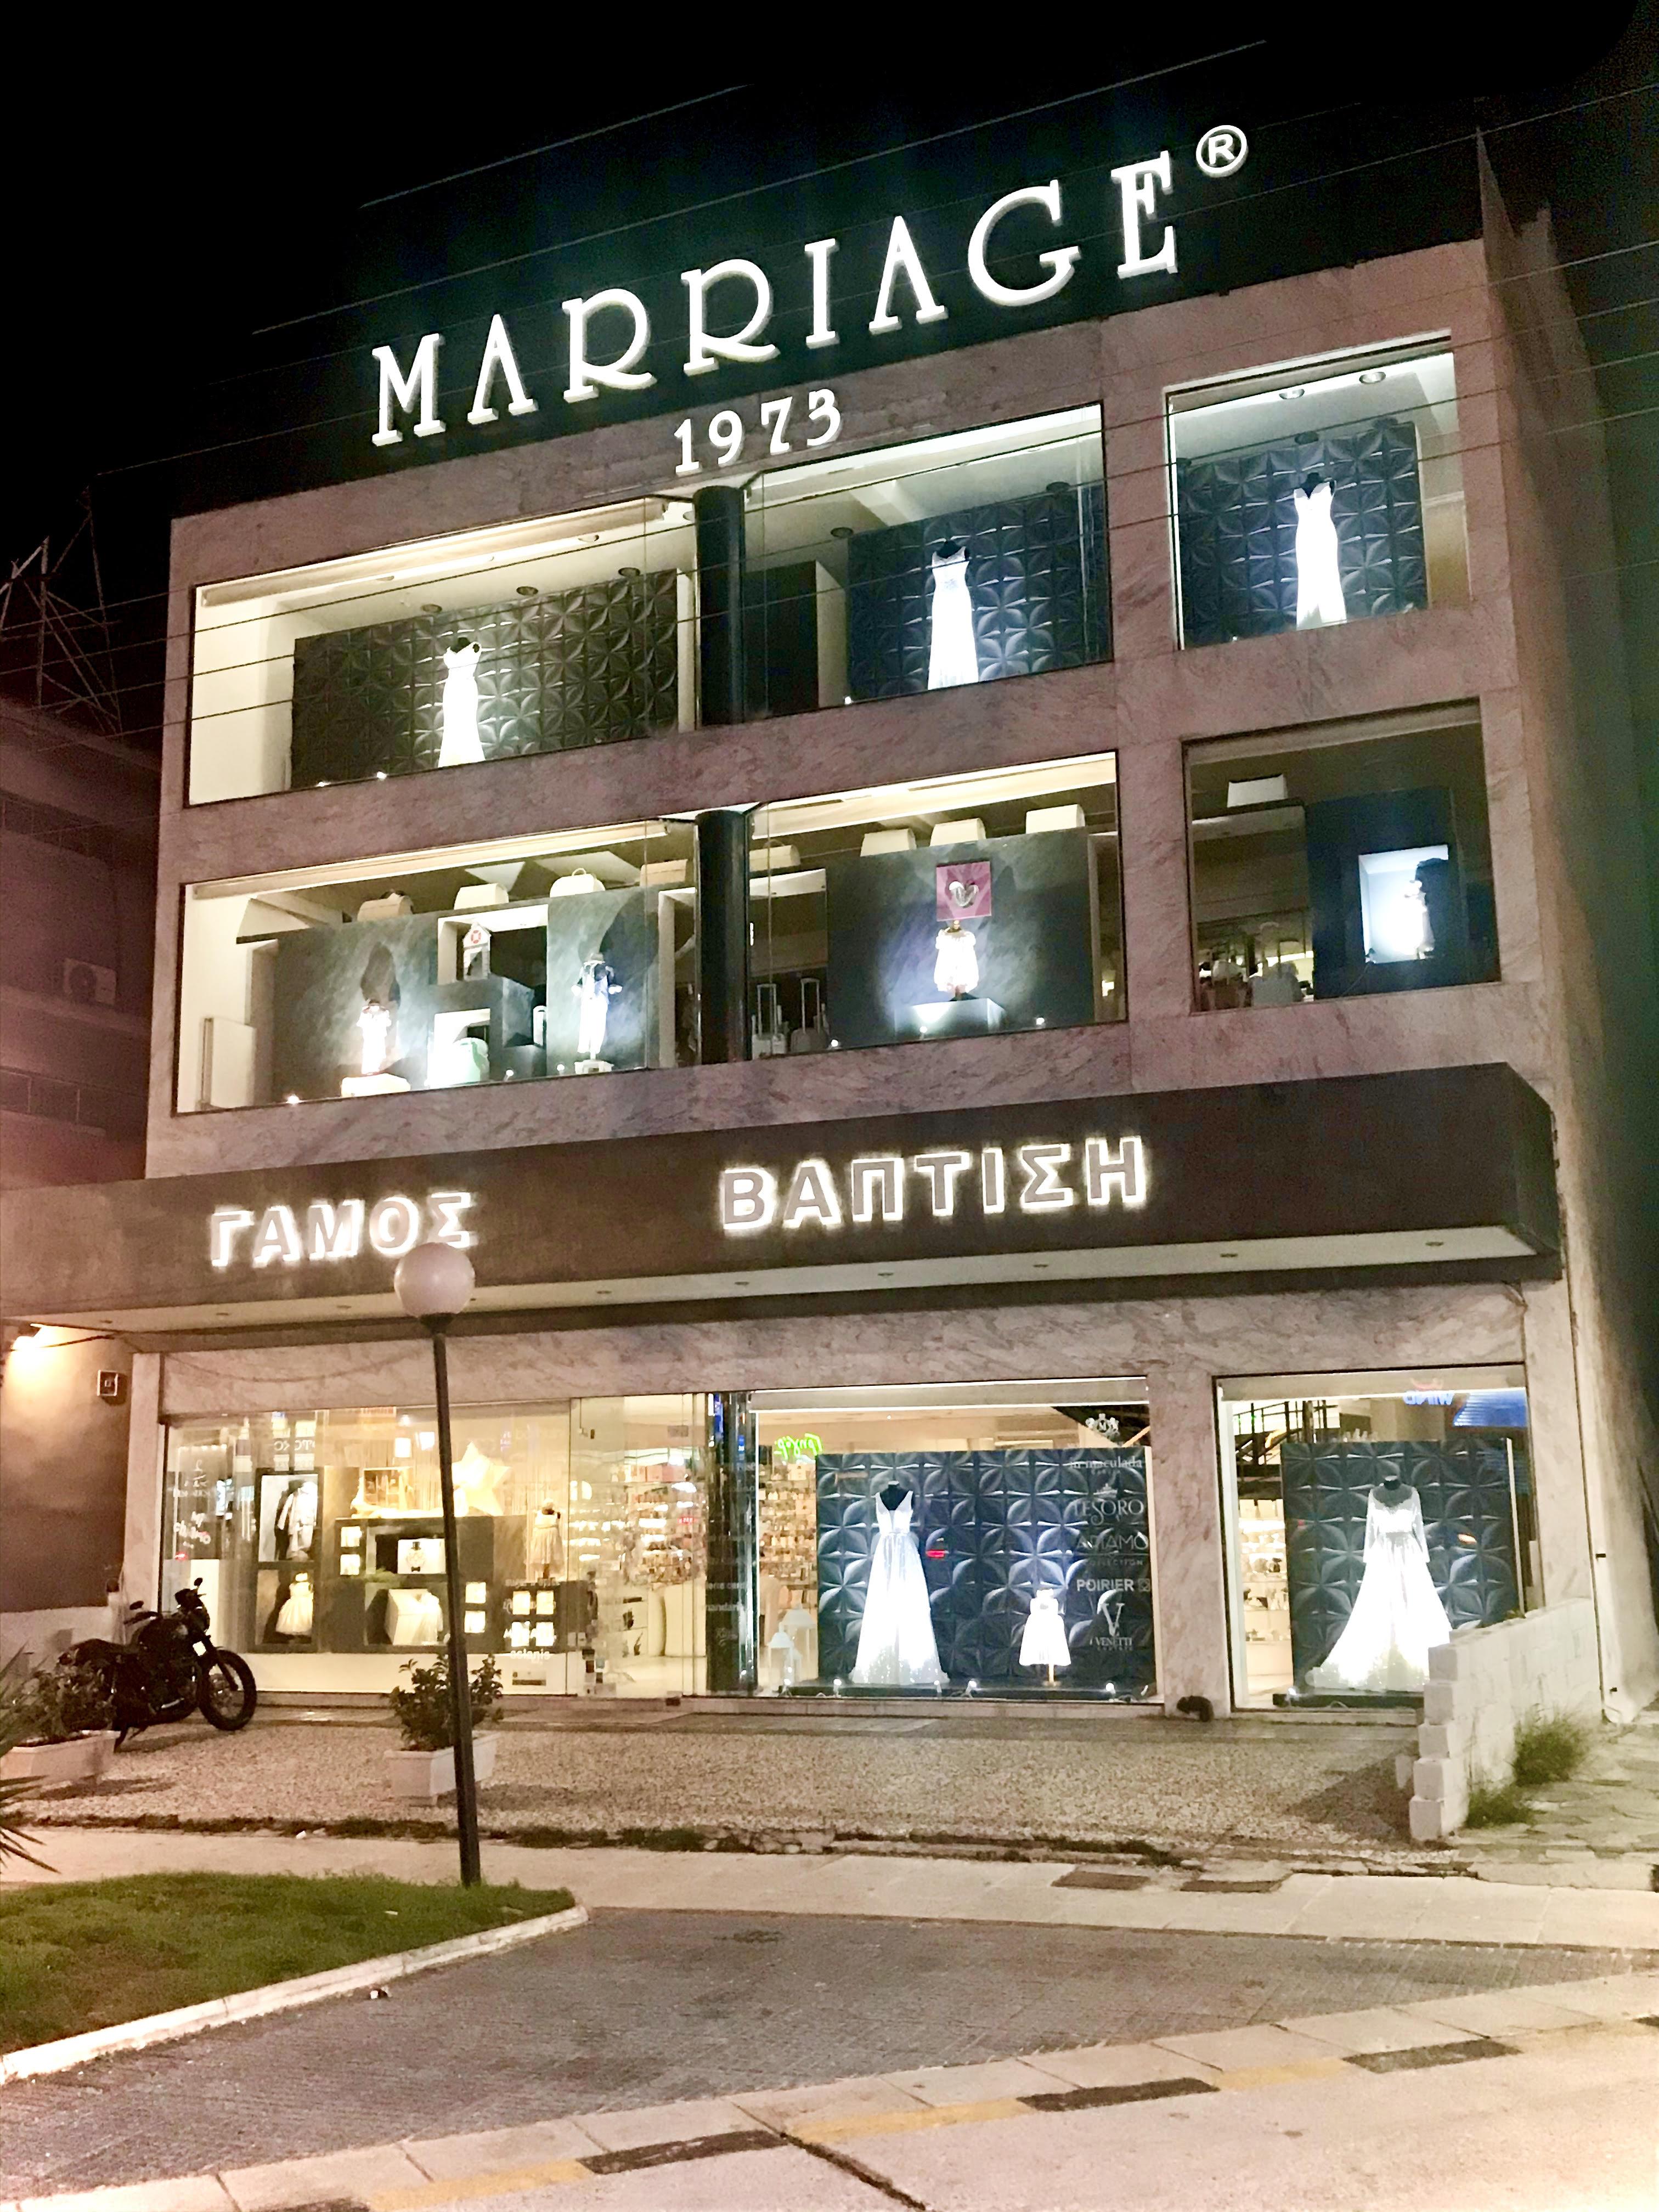 Contact | 210-9613867, 210-9615260 | Γούναρη 34 Ελληνικό | Άνω Γλυφάδα | marriagefashion@gmail.com | Facebook: Marriage Couture | Instagram @marriagefashion